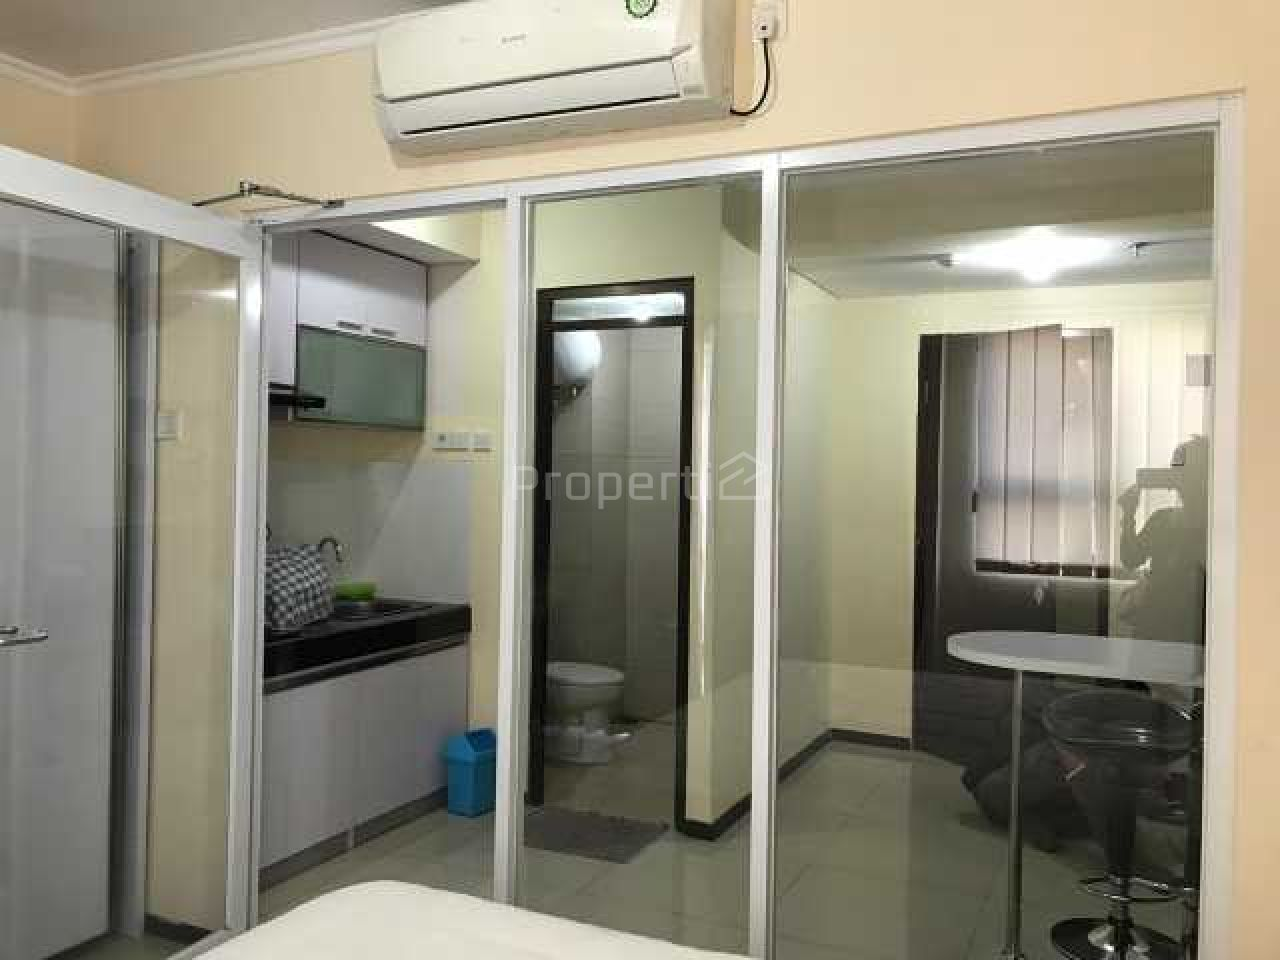 Unit 1 Kamar Tidur Lt. 6 Tower Topaz, Apartemen Gateway Pasteur, Kota Bandung